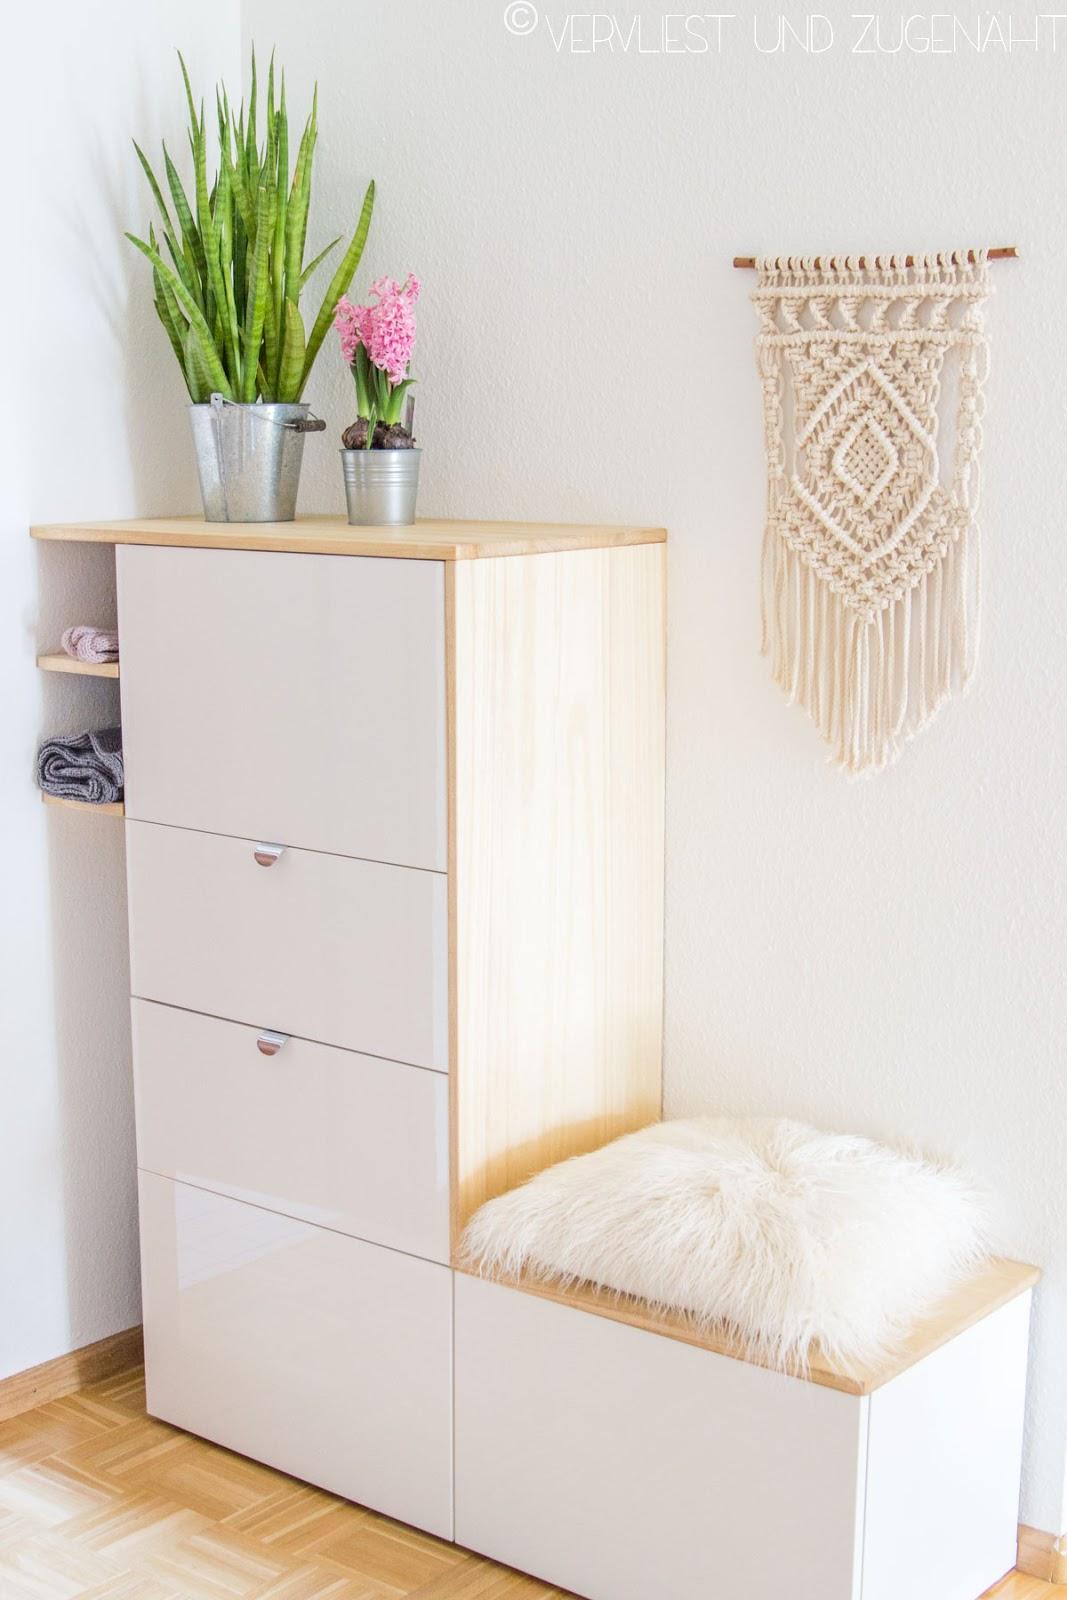 Vervliest und zugenäht Macramee Wandbehang & Ikea Hack für Besta